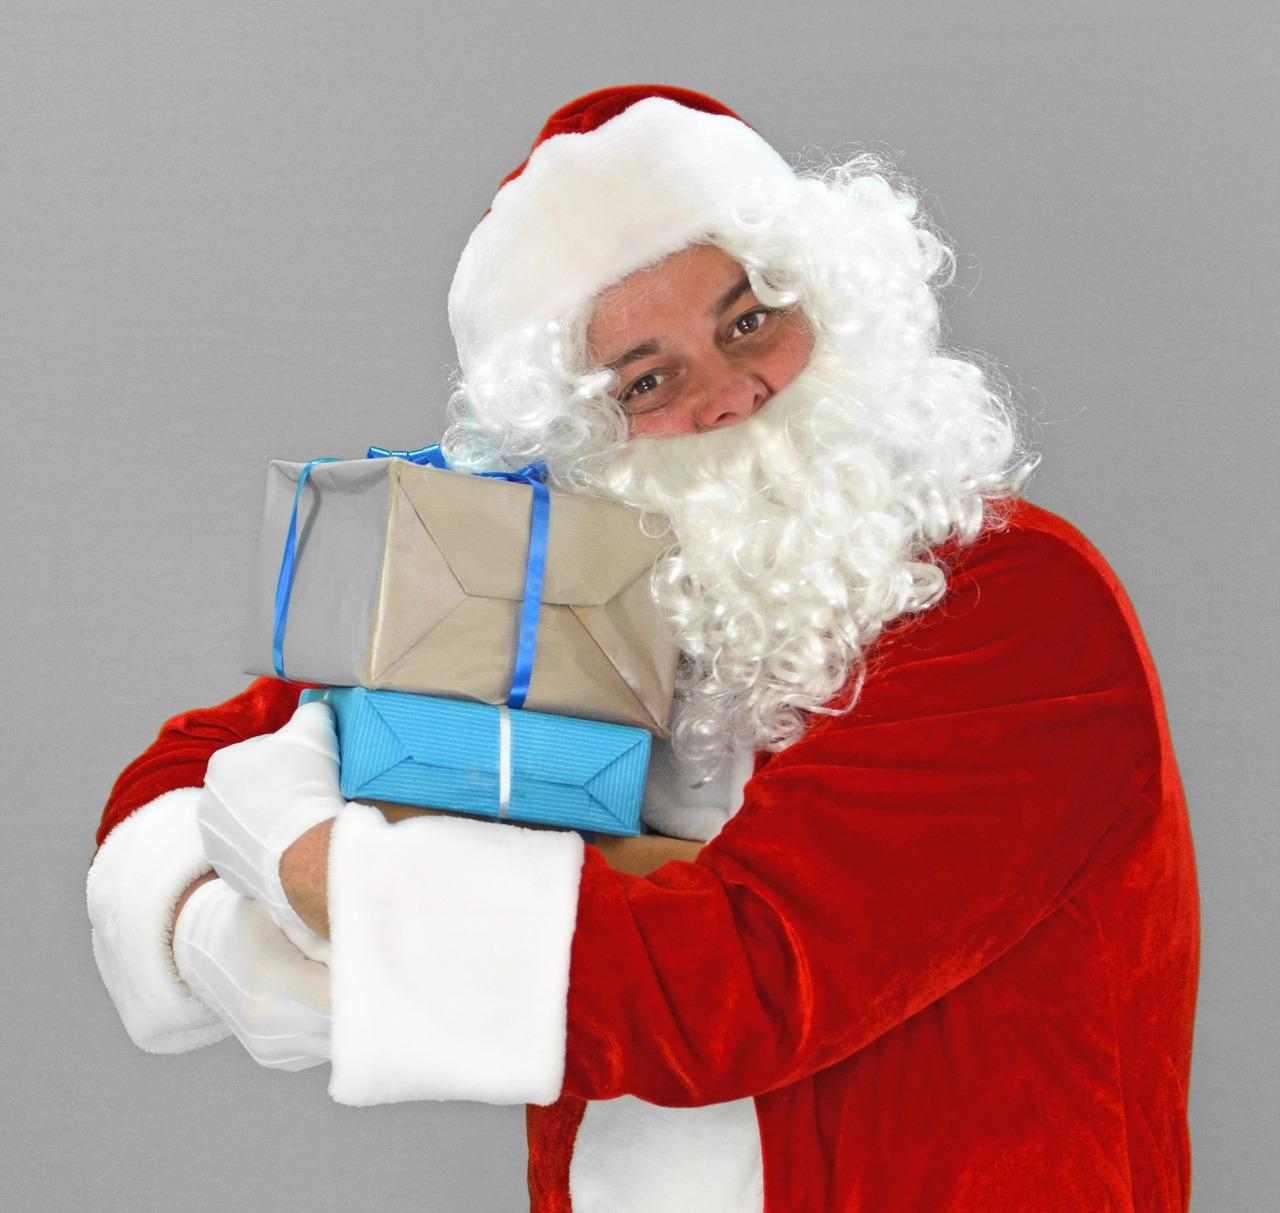 pere noel cadeaux